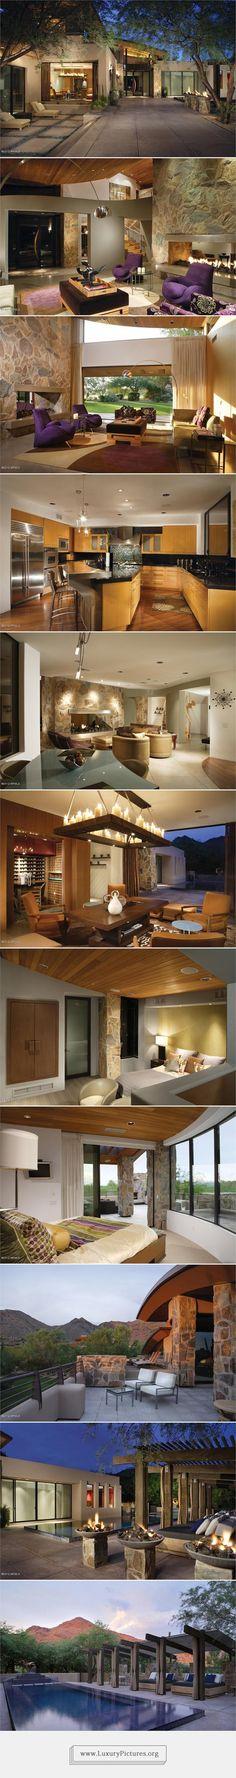 9 Gorgeous Luxury Homes in Scottsdale, Arizona